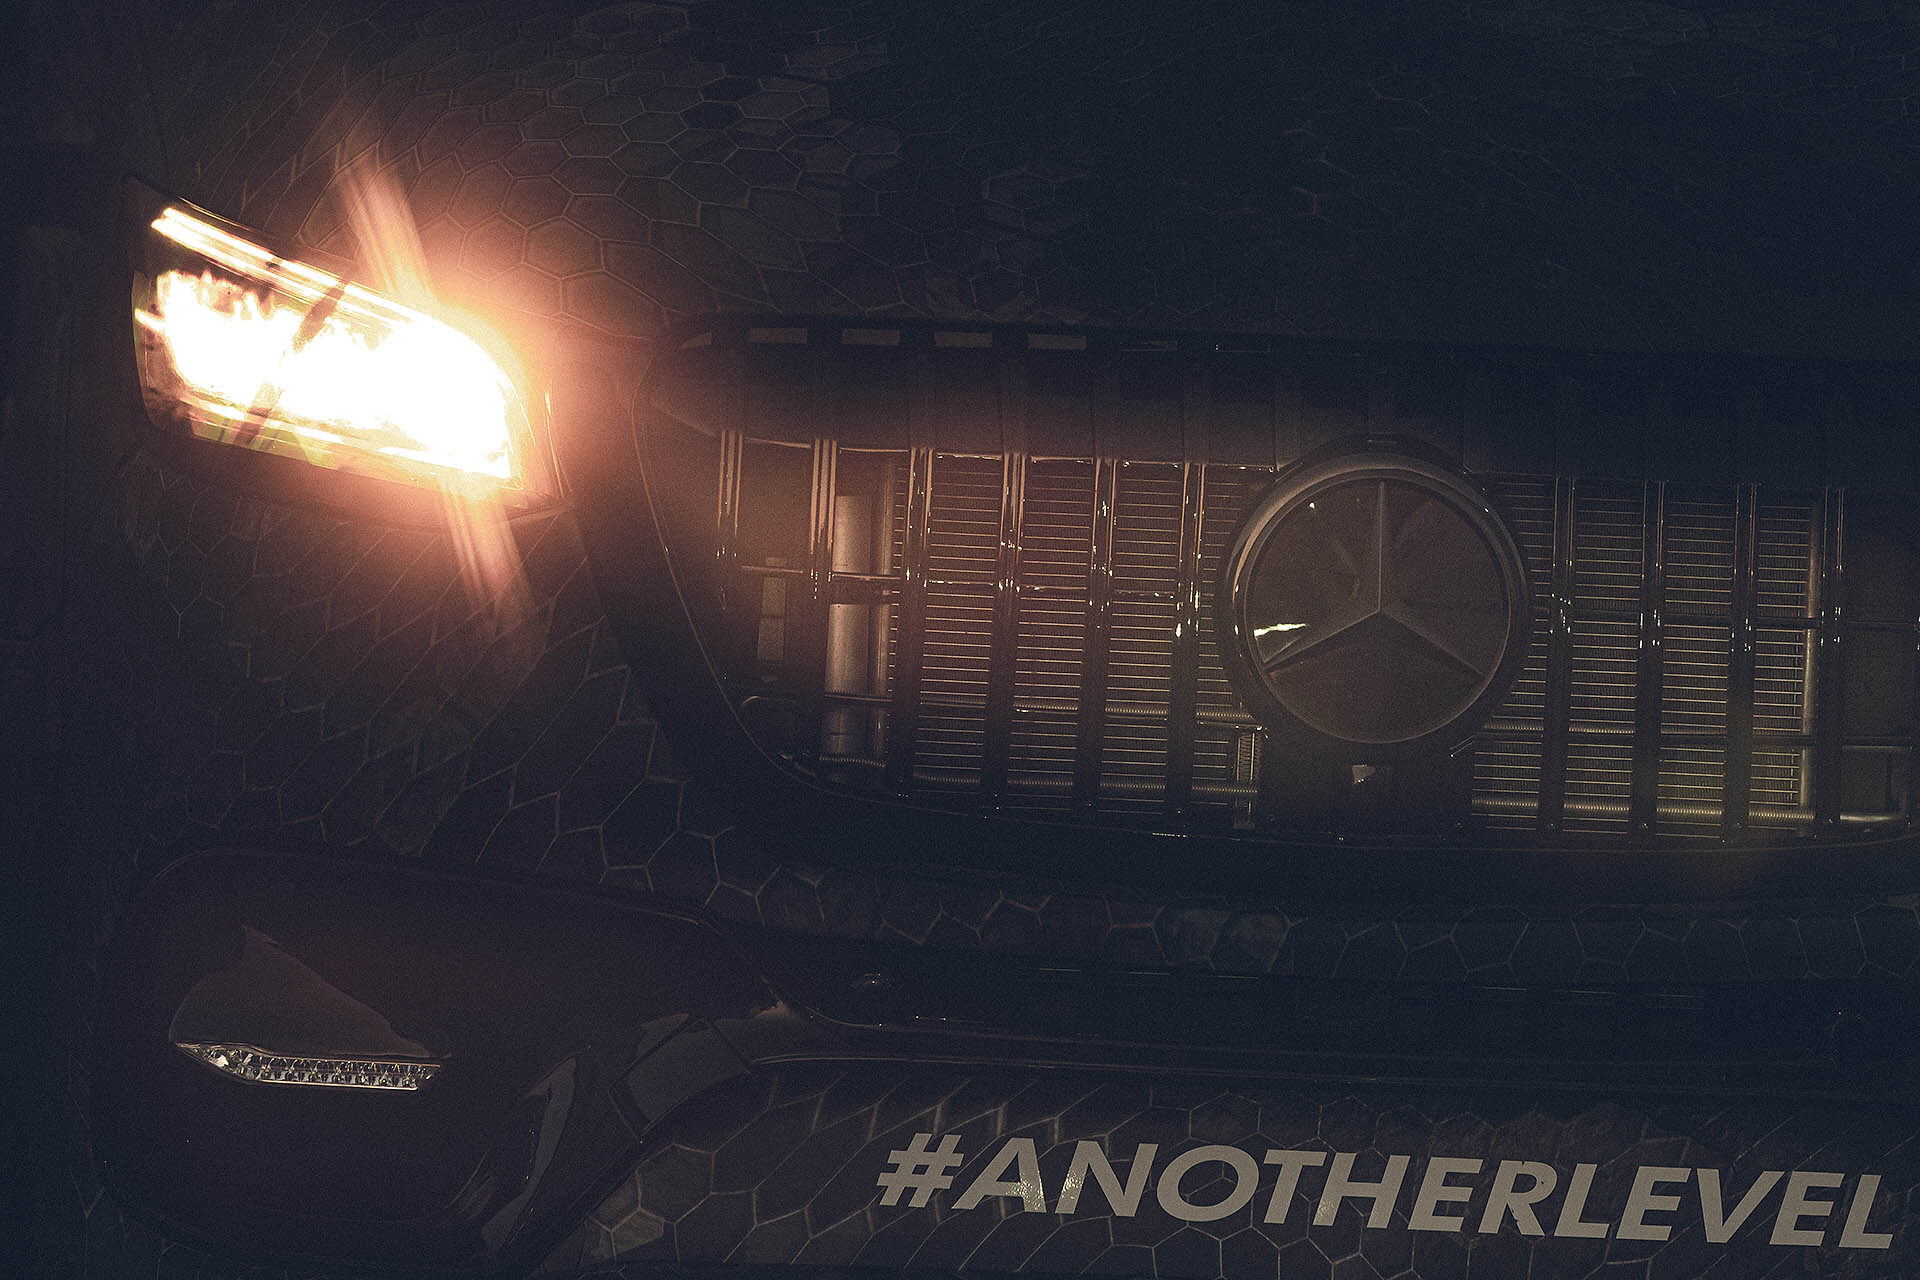 #anotherlevel